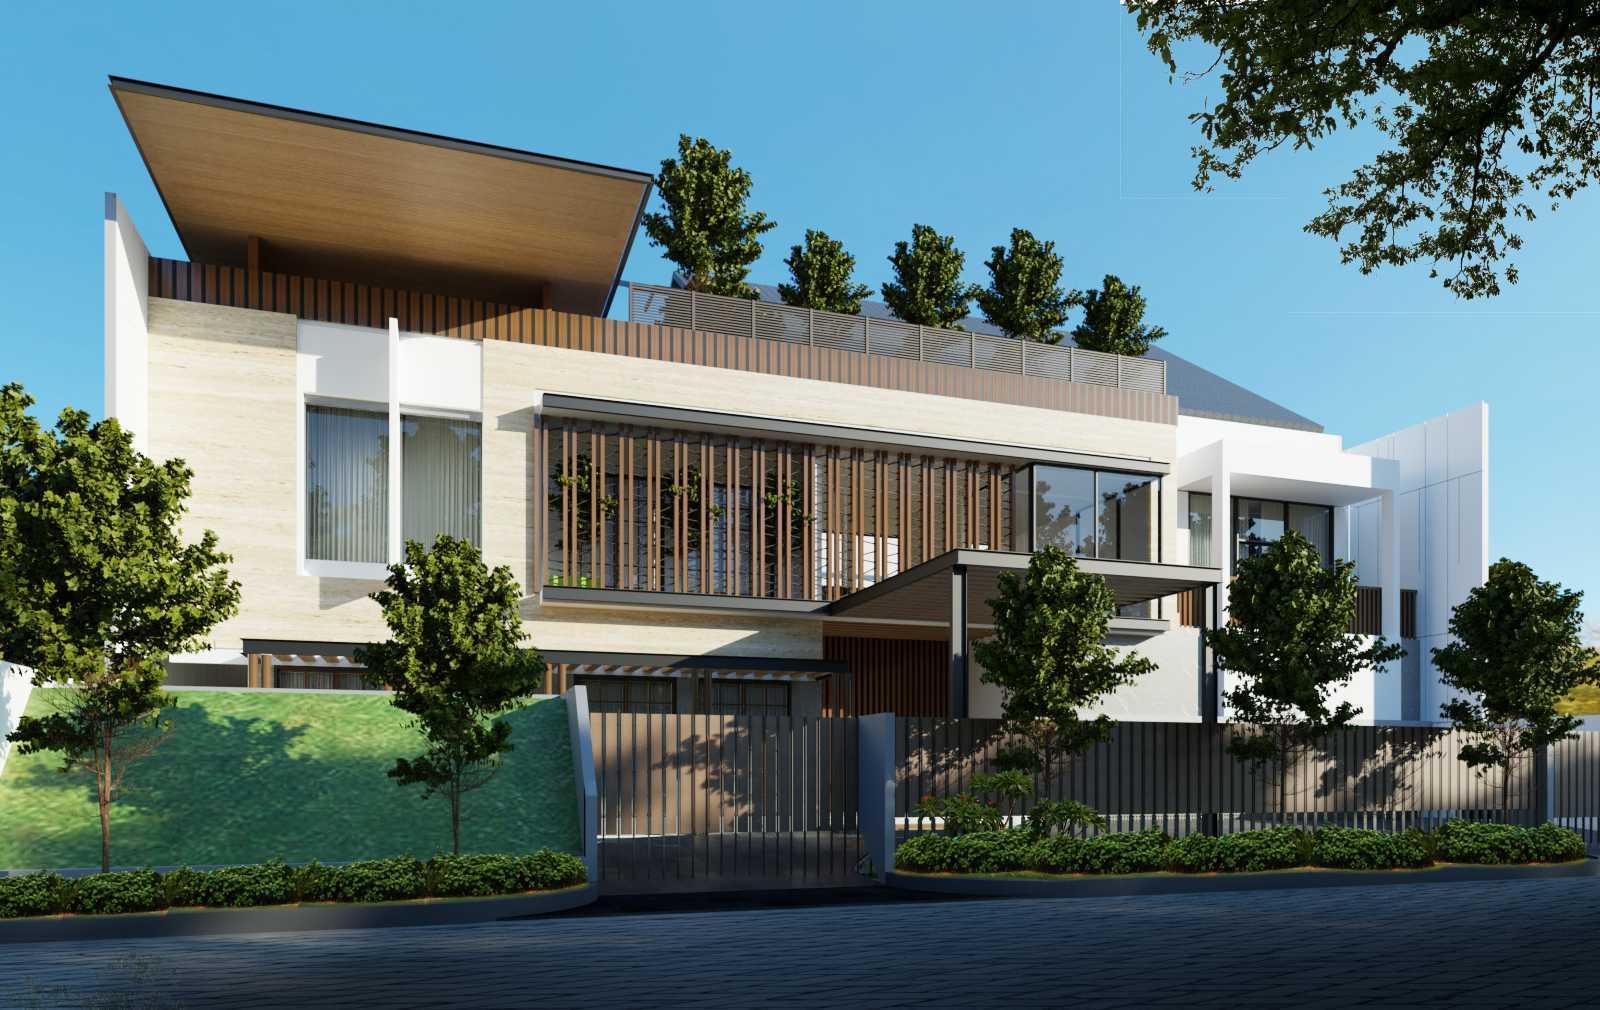 Pt Alradista Desain Indonesia T House Senayan, Jakarta Senayan, Jakarta Pt-Alradista-Desain-Indonesia-T-House  105894